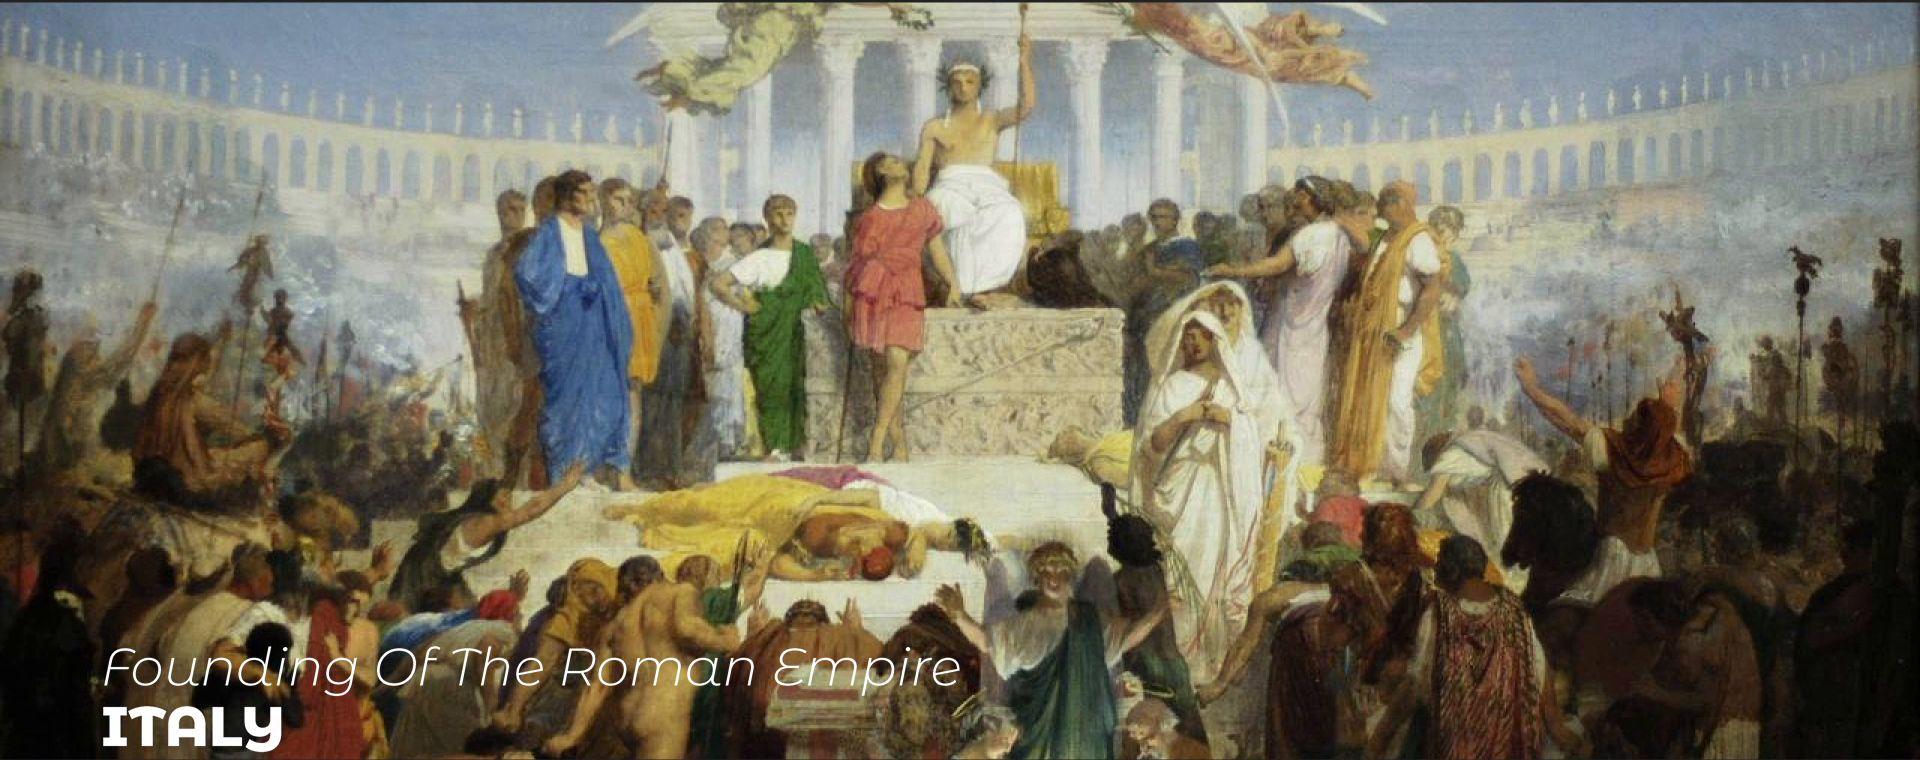 FOUNDING OF THE ROMAN EMPIRE